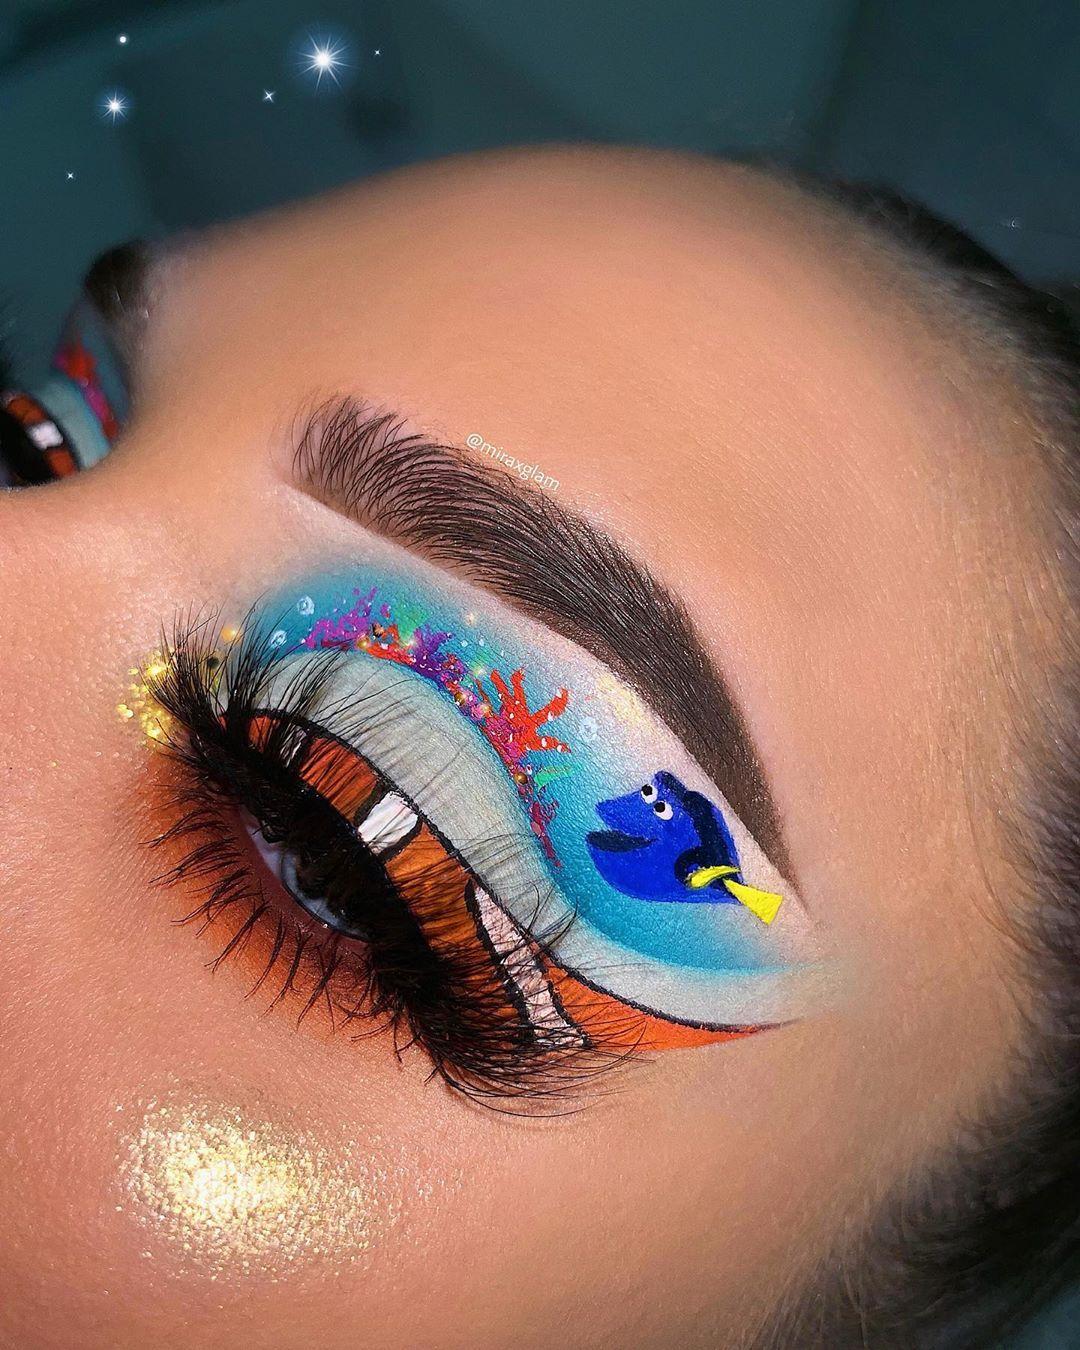 Miranda Sipko On Instagram Finding Nemo Day One Of My